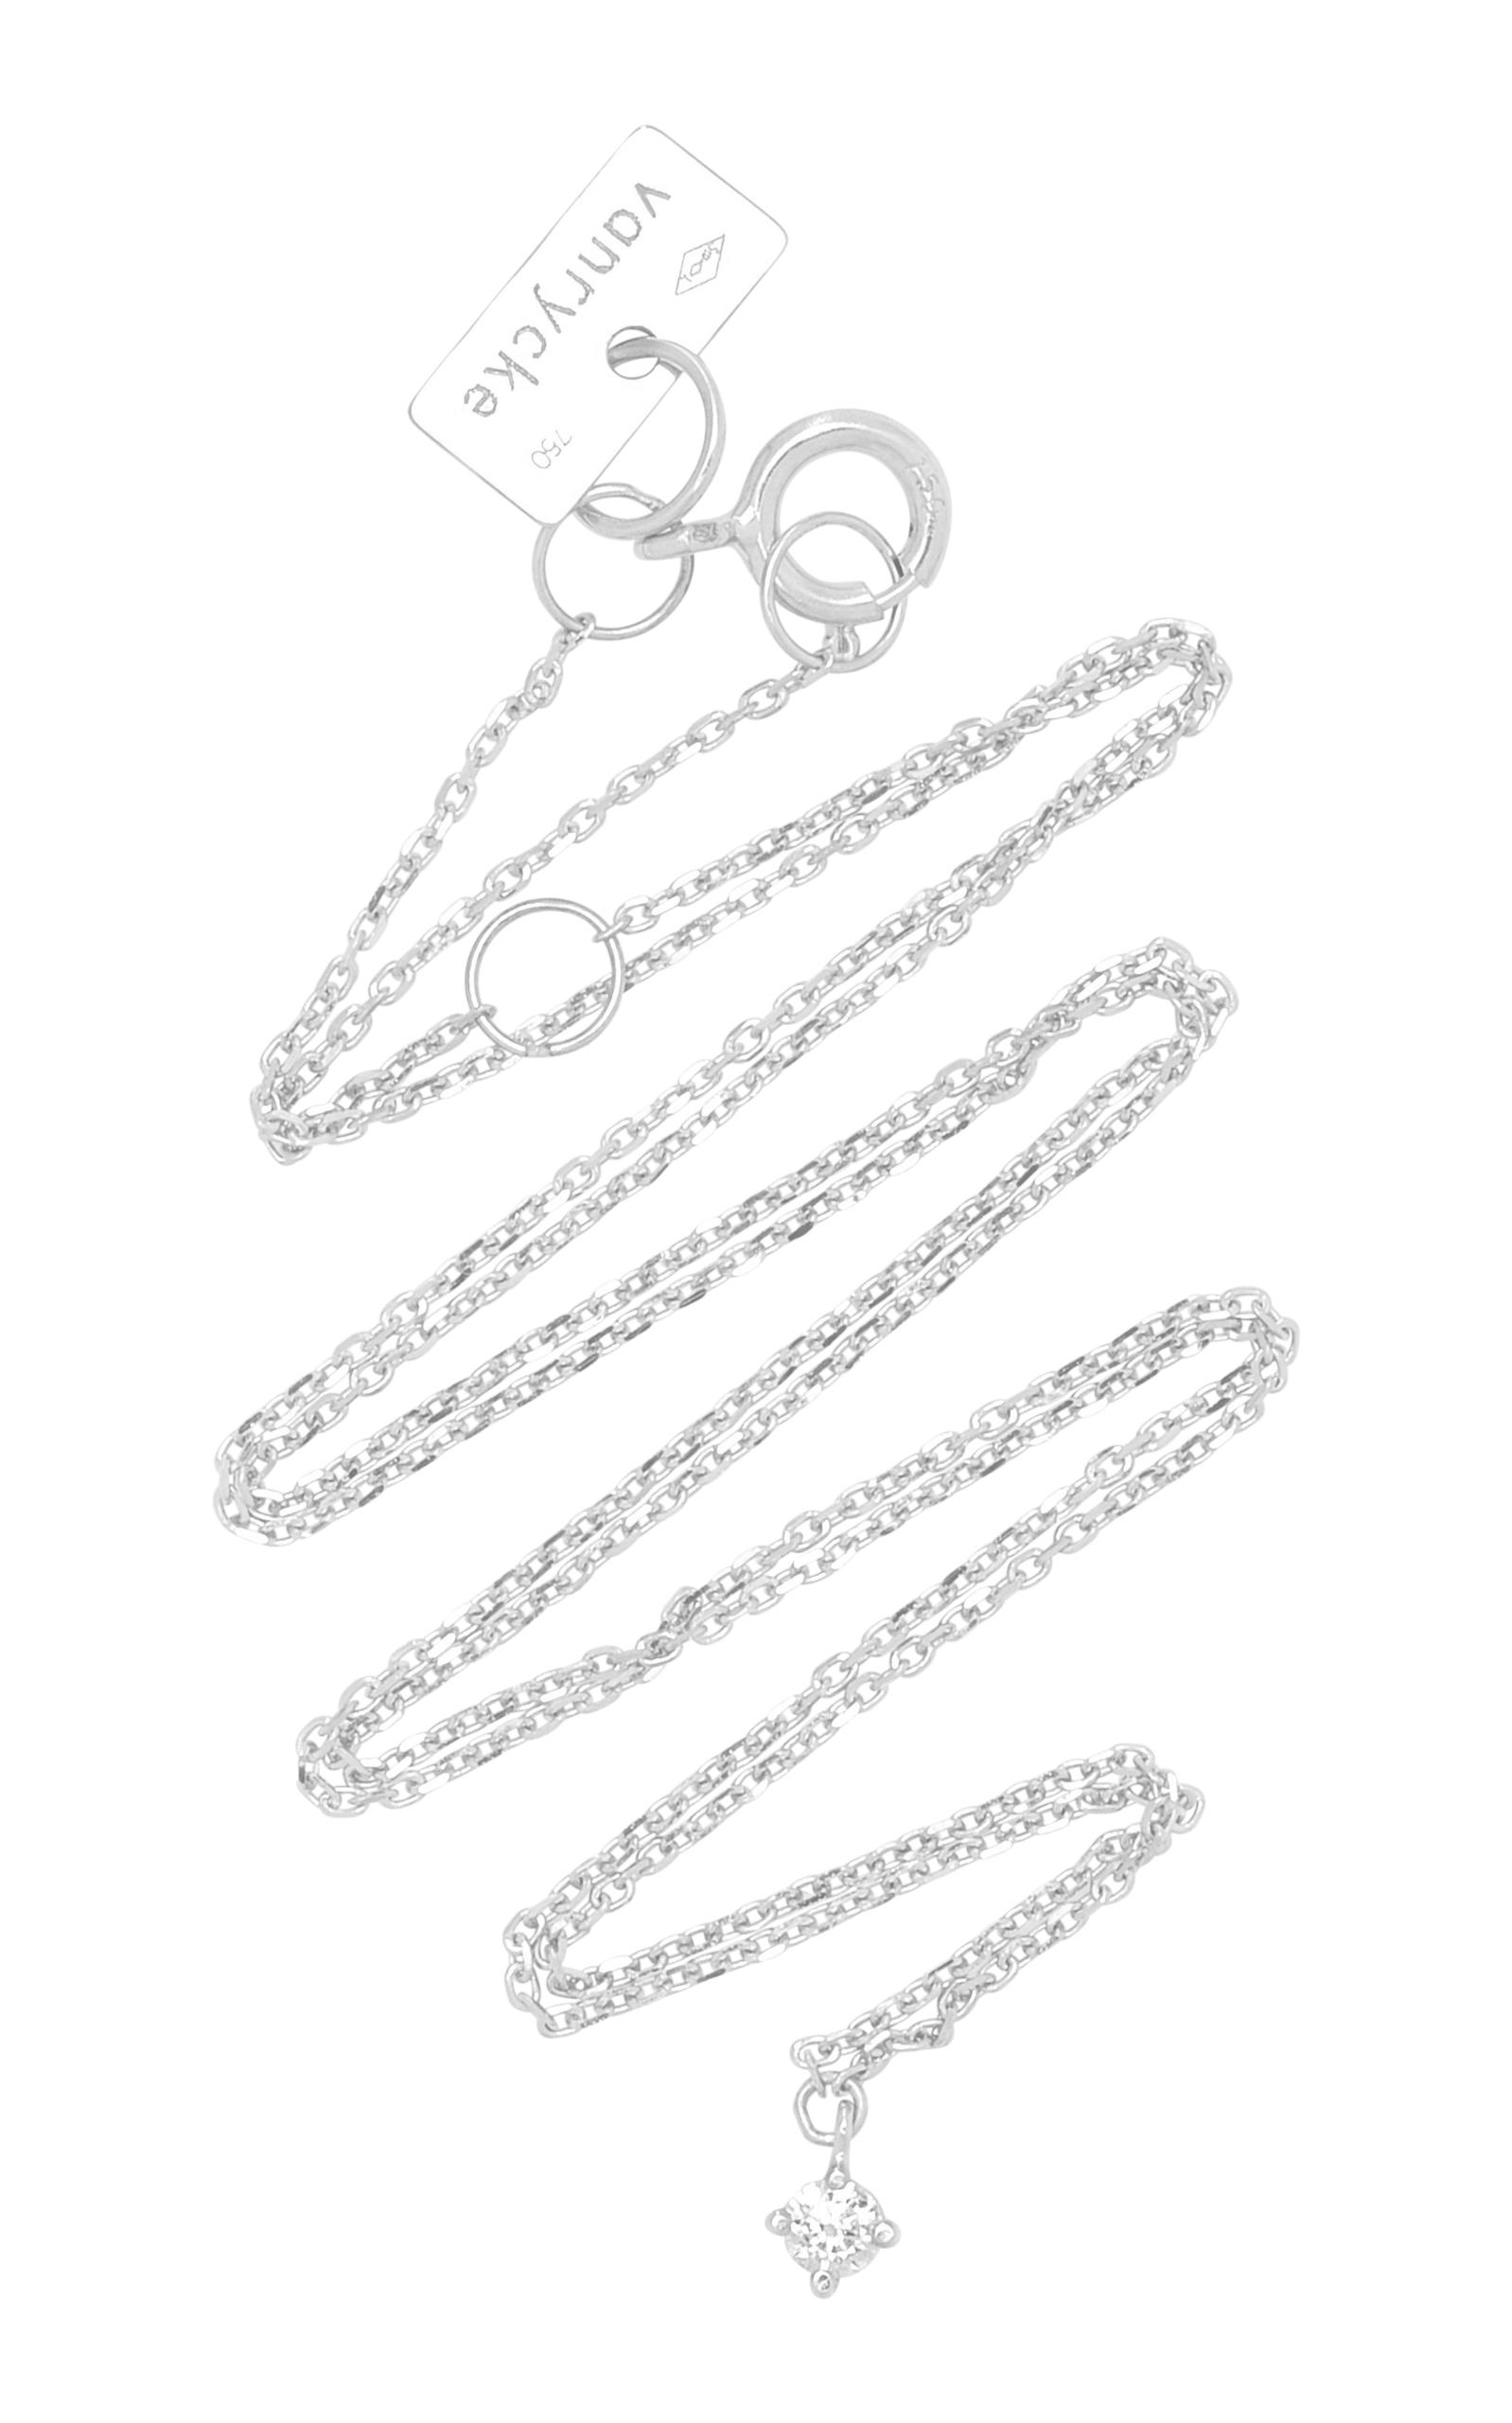 VANRYCKE M'O Exclusive 18K White Gold Diamond Choker in Silver